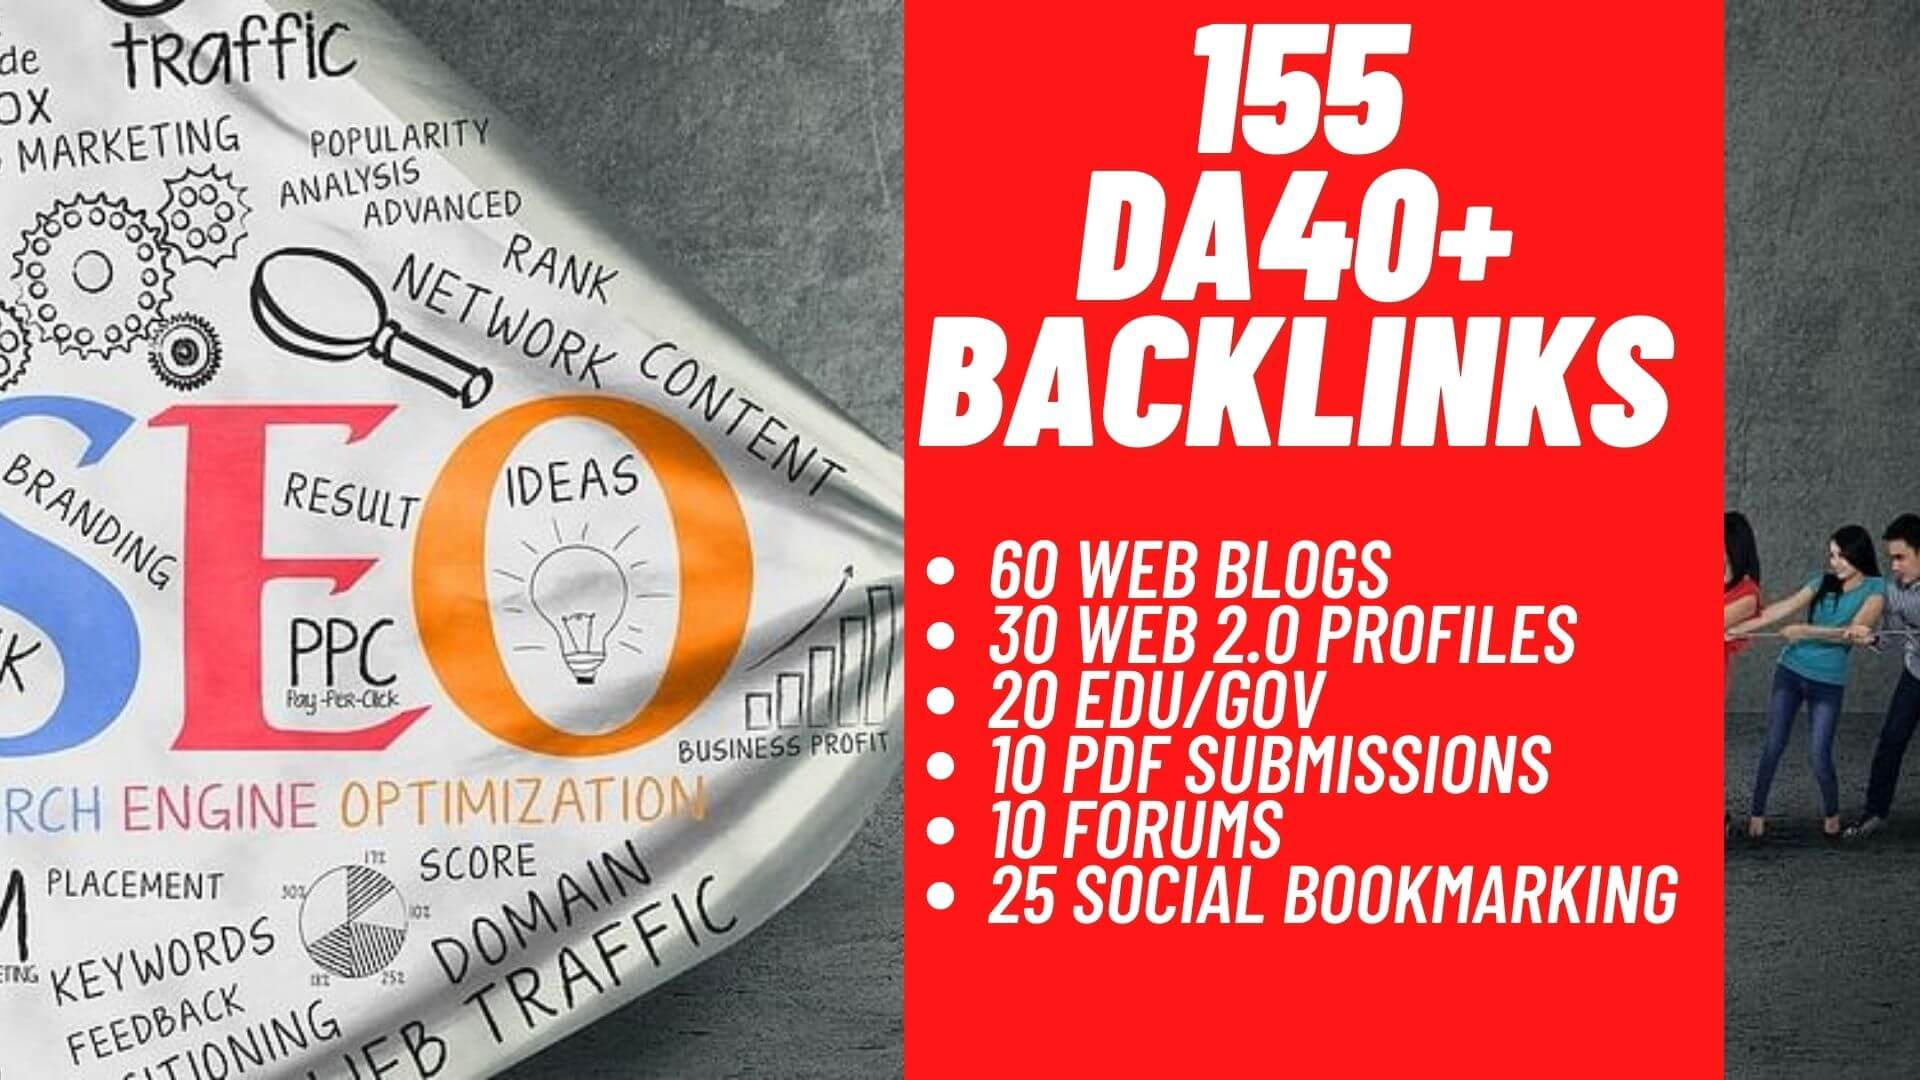 Manually 155 DA40+ Backlinks 60 web blogs 30 Web 2.0 Profiles 20 Edu/Gov 10 pdf 10 forums 25